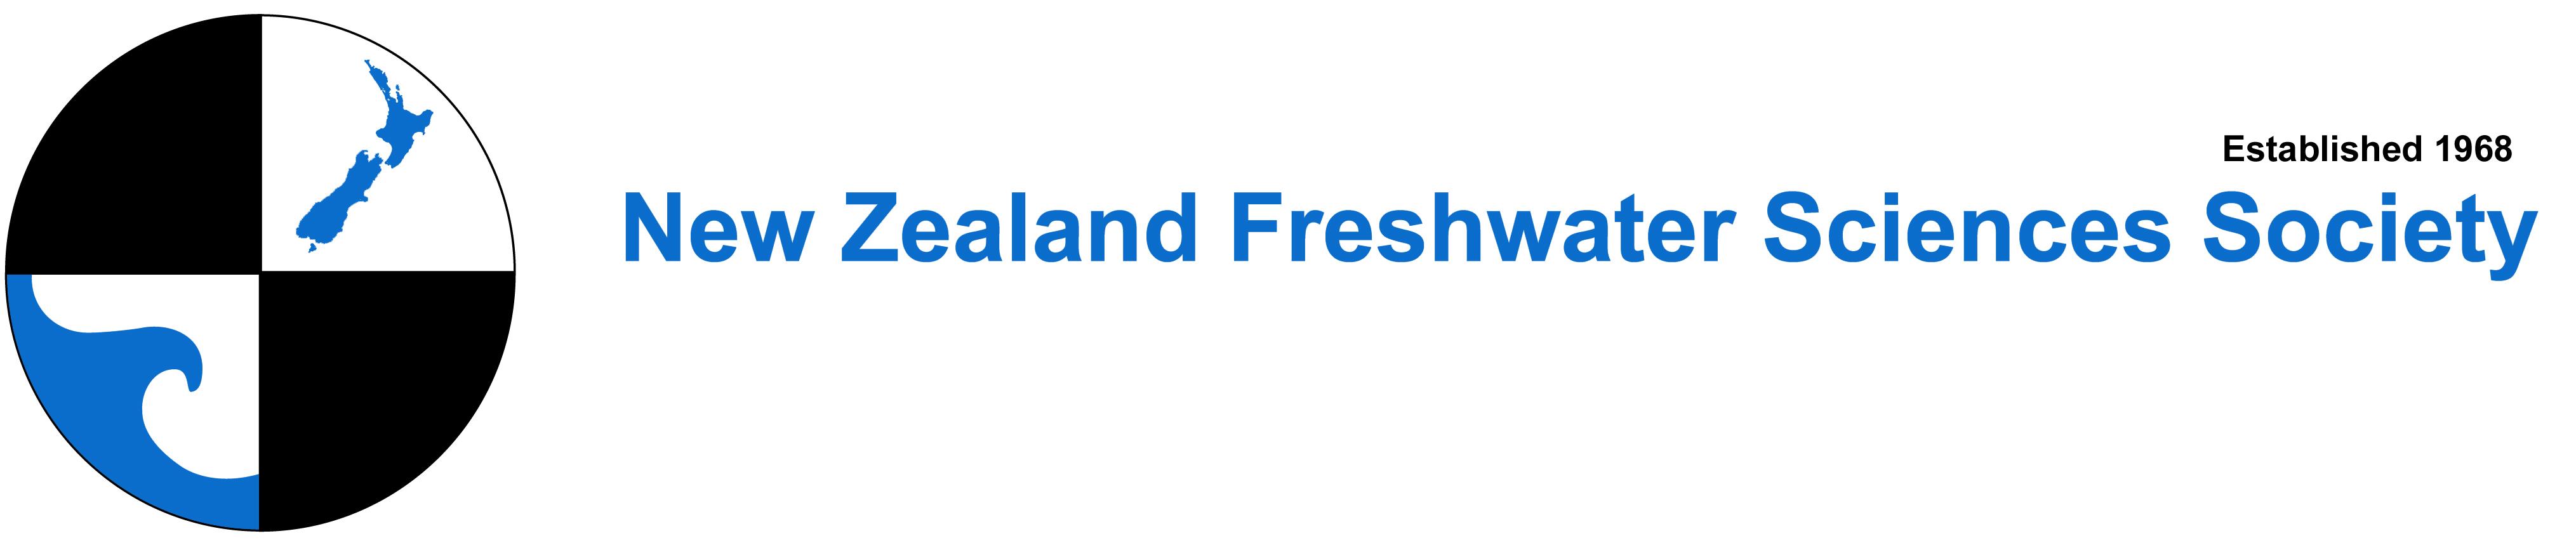 NZFSS Logo